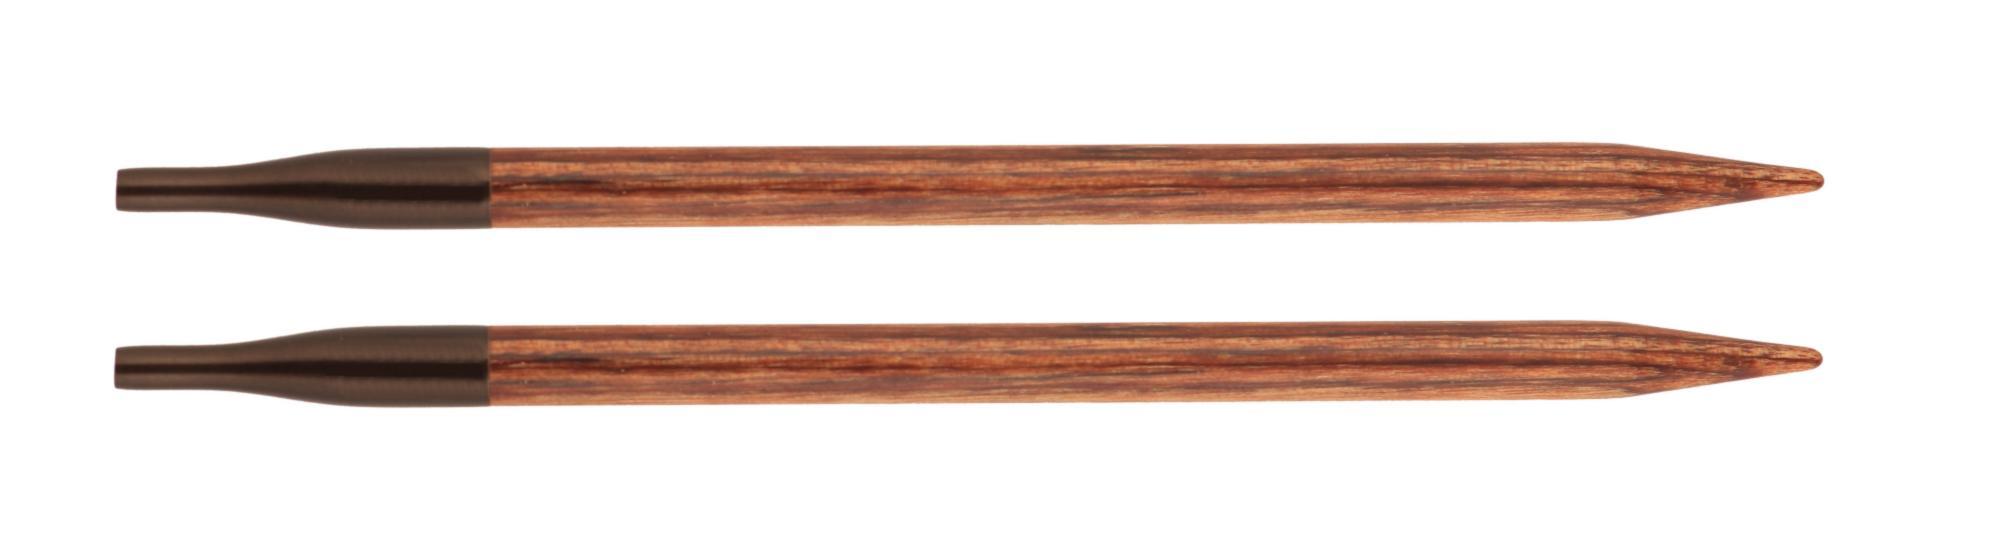 31202 Спицы съемные 3.25 мм Ginger KnitPro